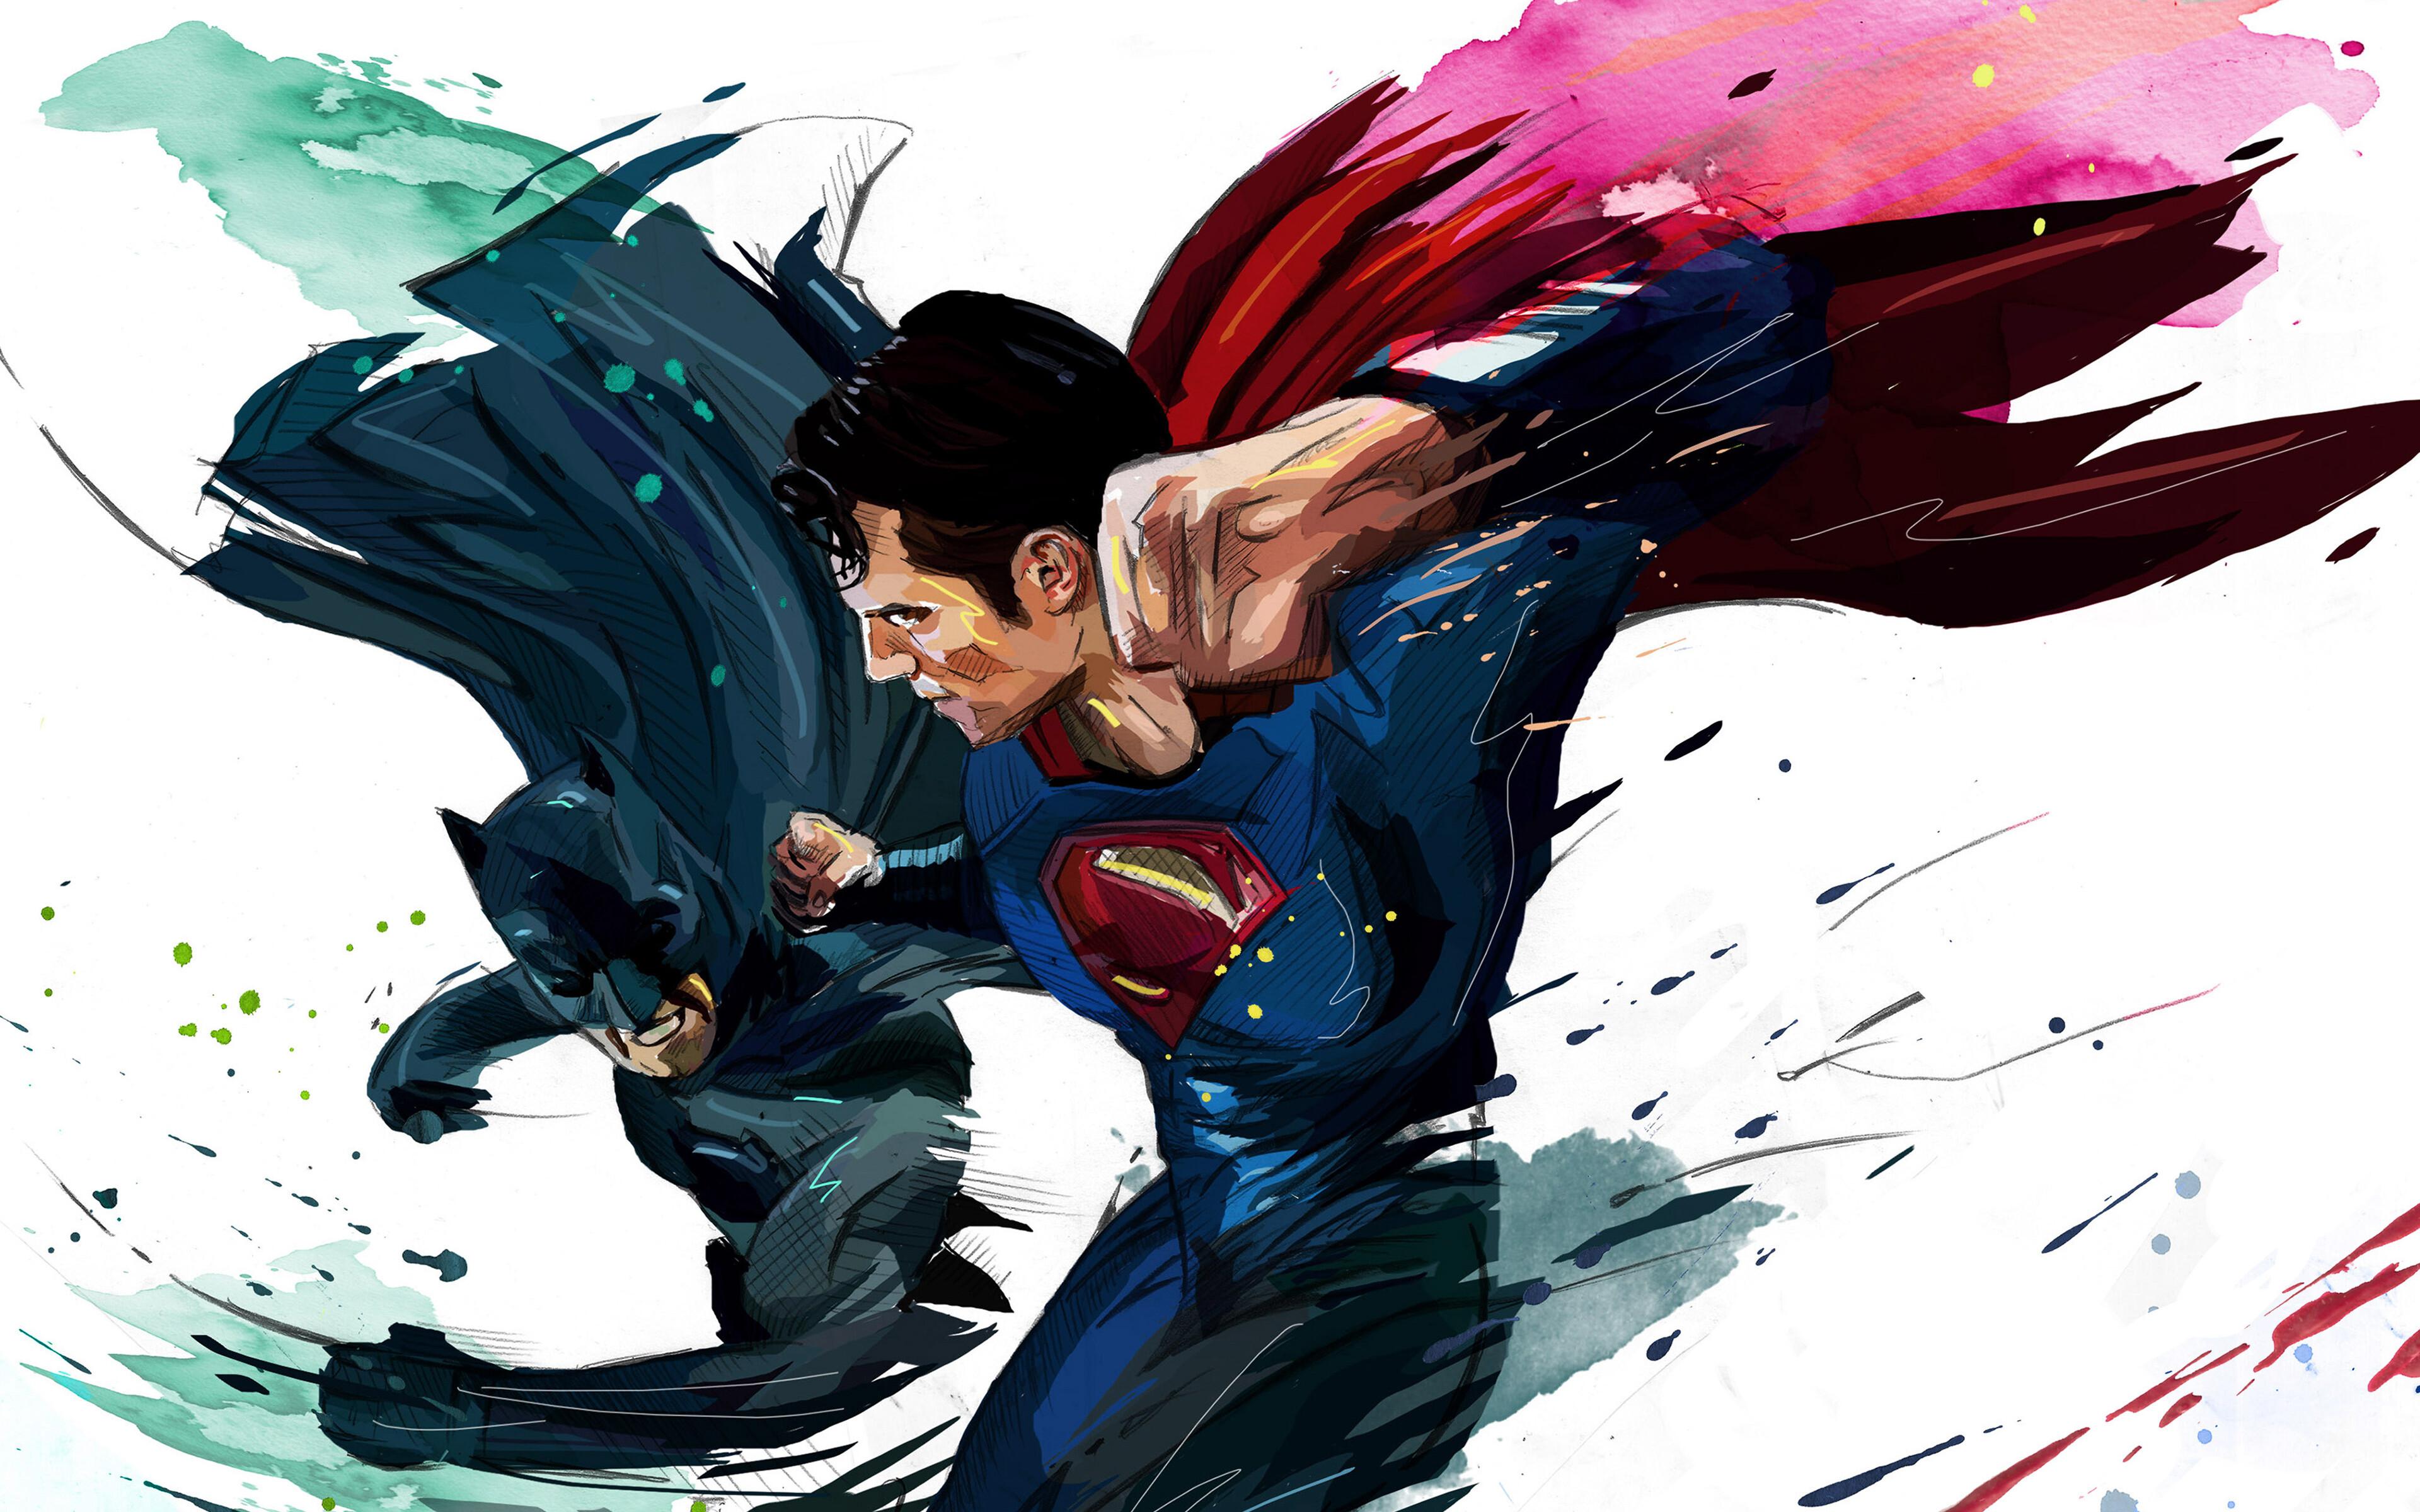 batman-and-superman-artwork-4k-io.jpg